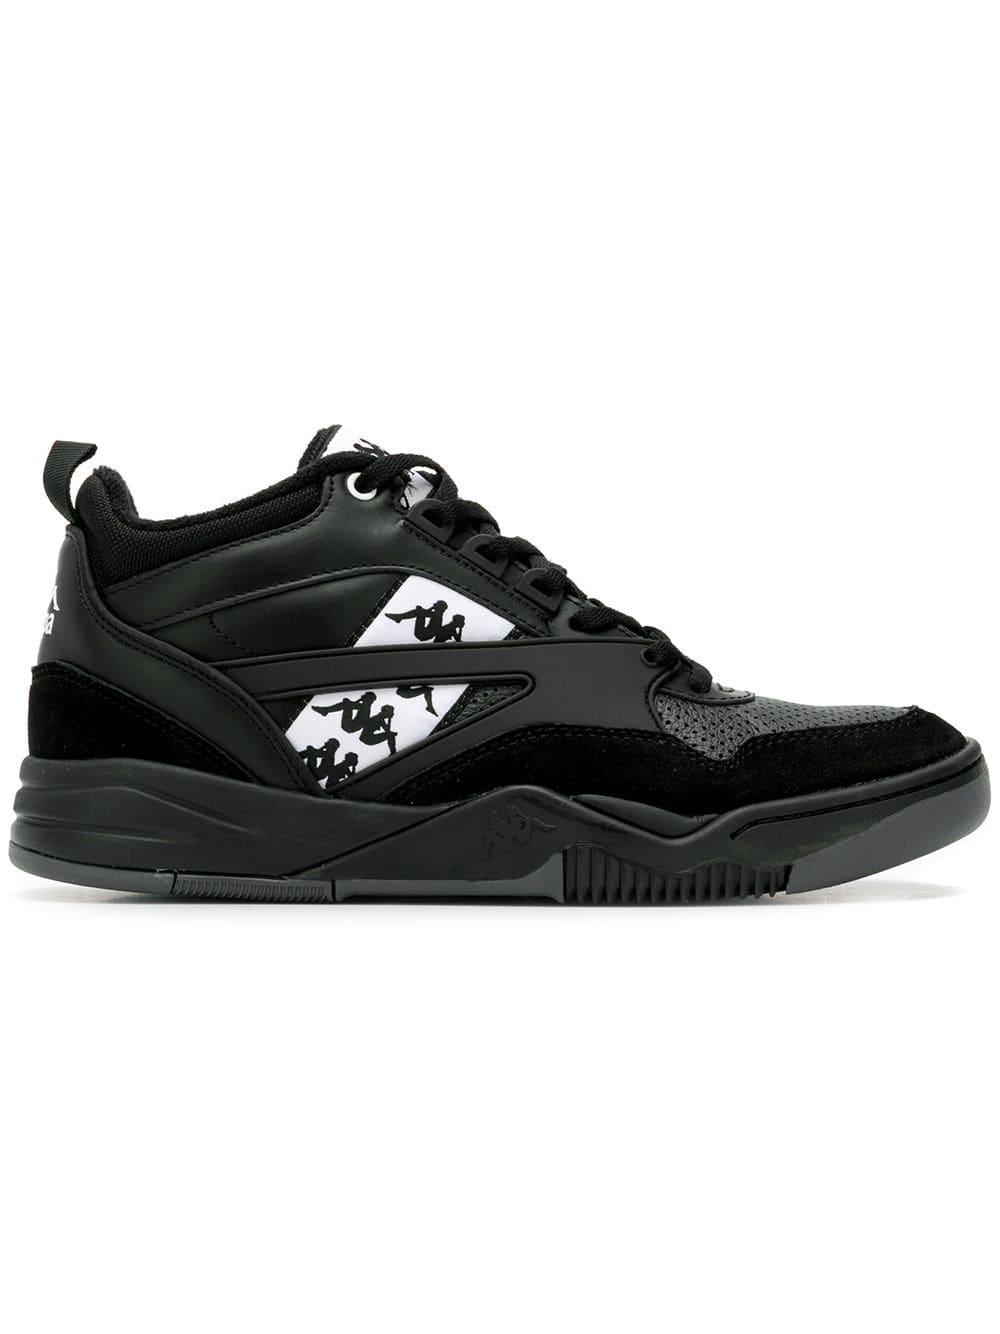 Kappa hi-top sneakers - Black - Glami.sk b2bedc0248